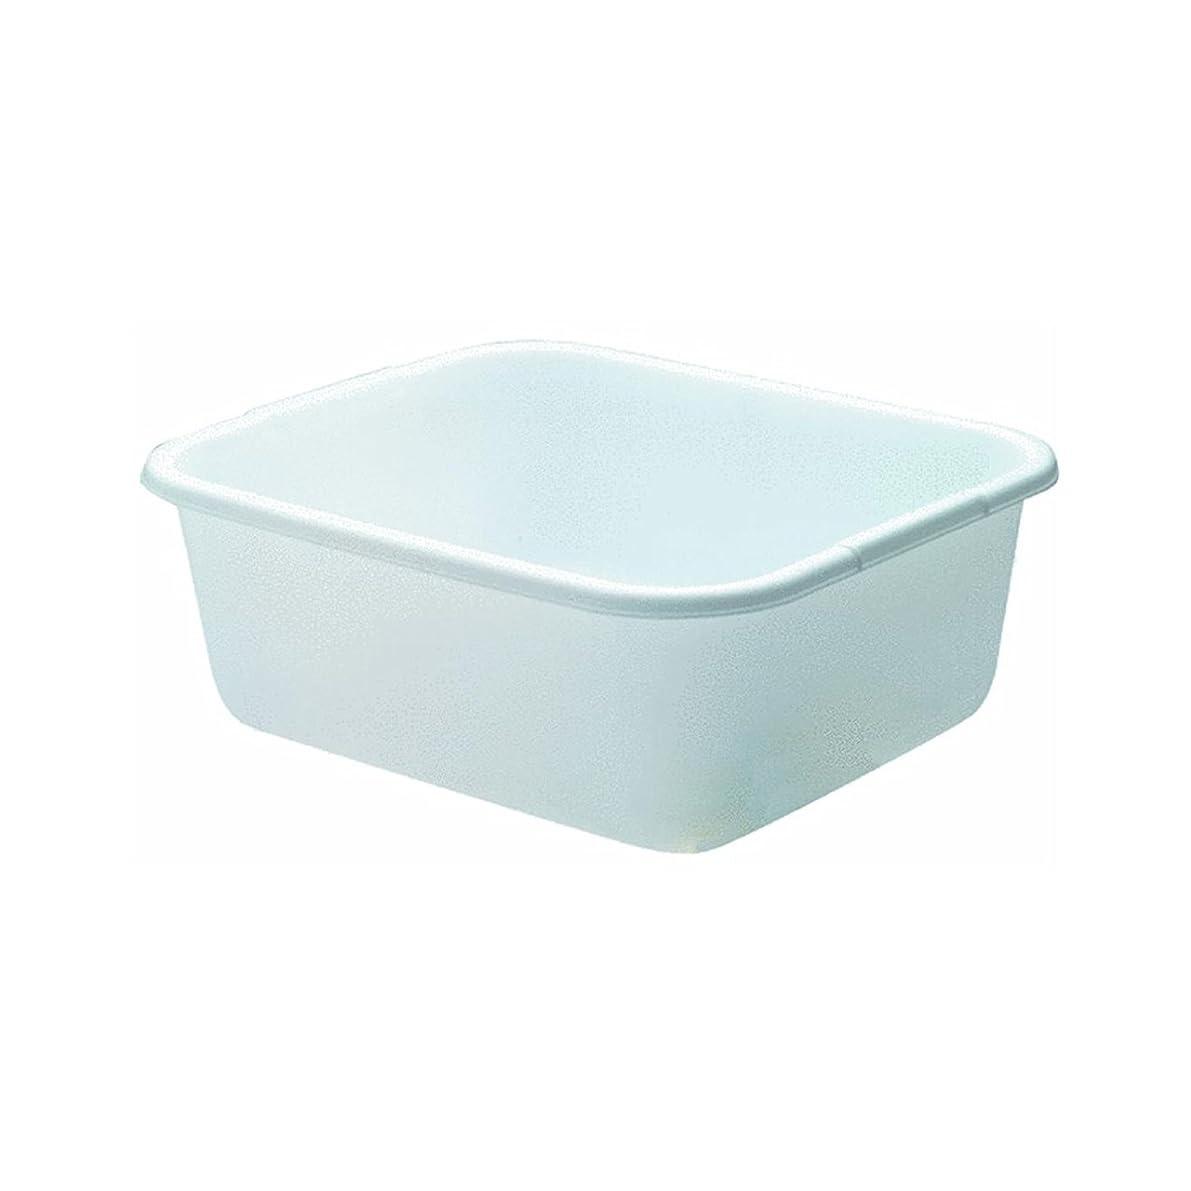 RHP2951ARWHT - Rubbermaid Microban Dishpan, 4.5gal, White